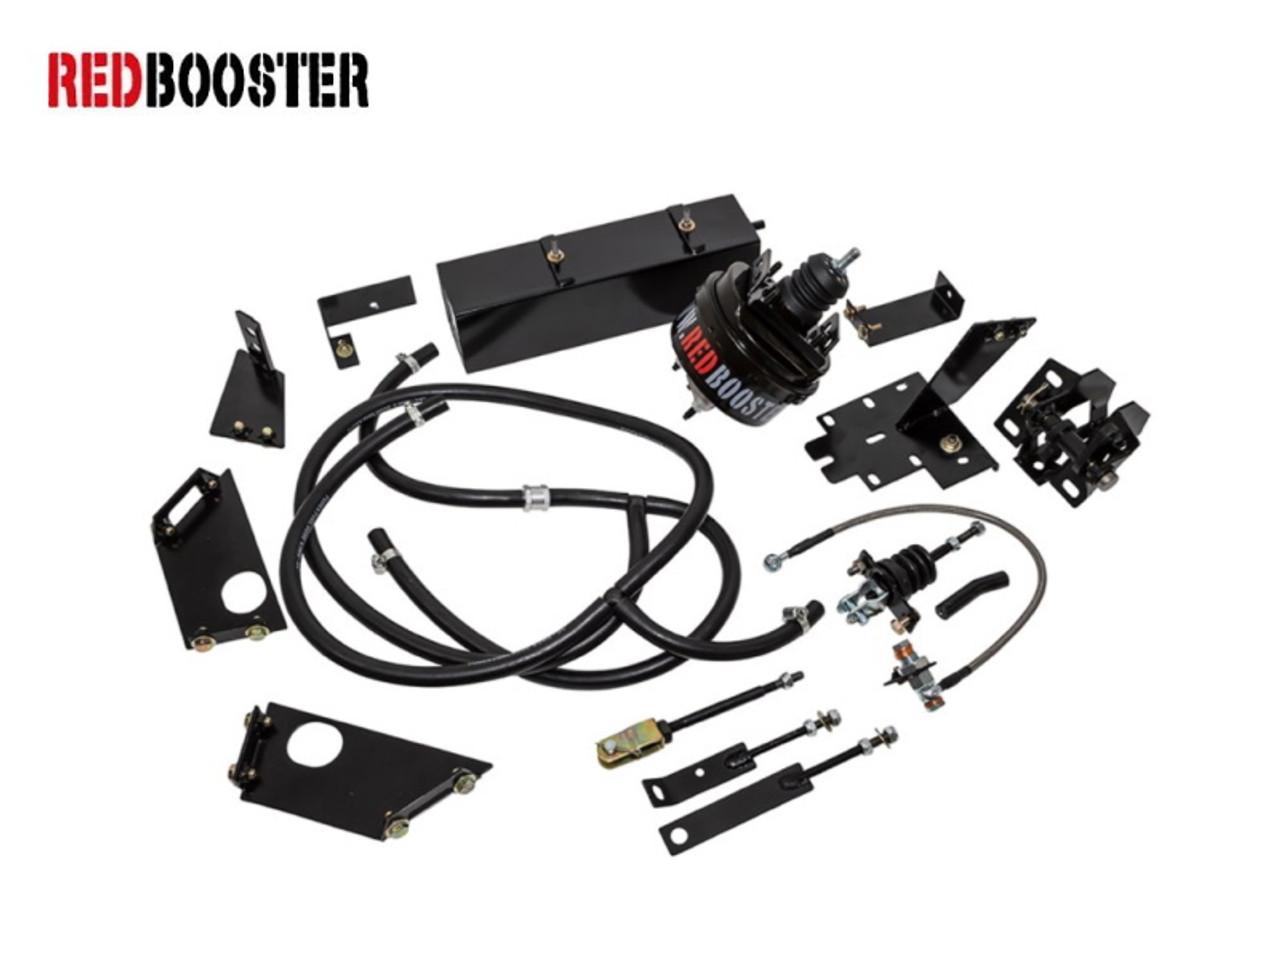 Red Booster Defender 200Tdi And 300Tdi LHD Servo Clutch Kit - DA1955